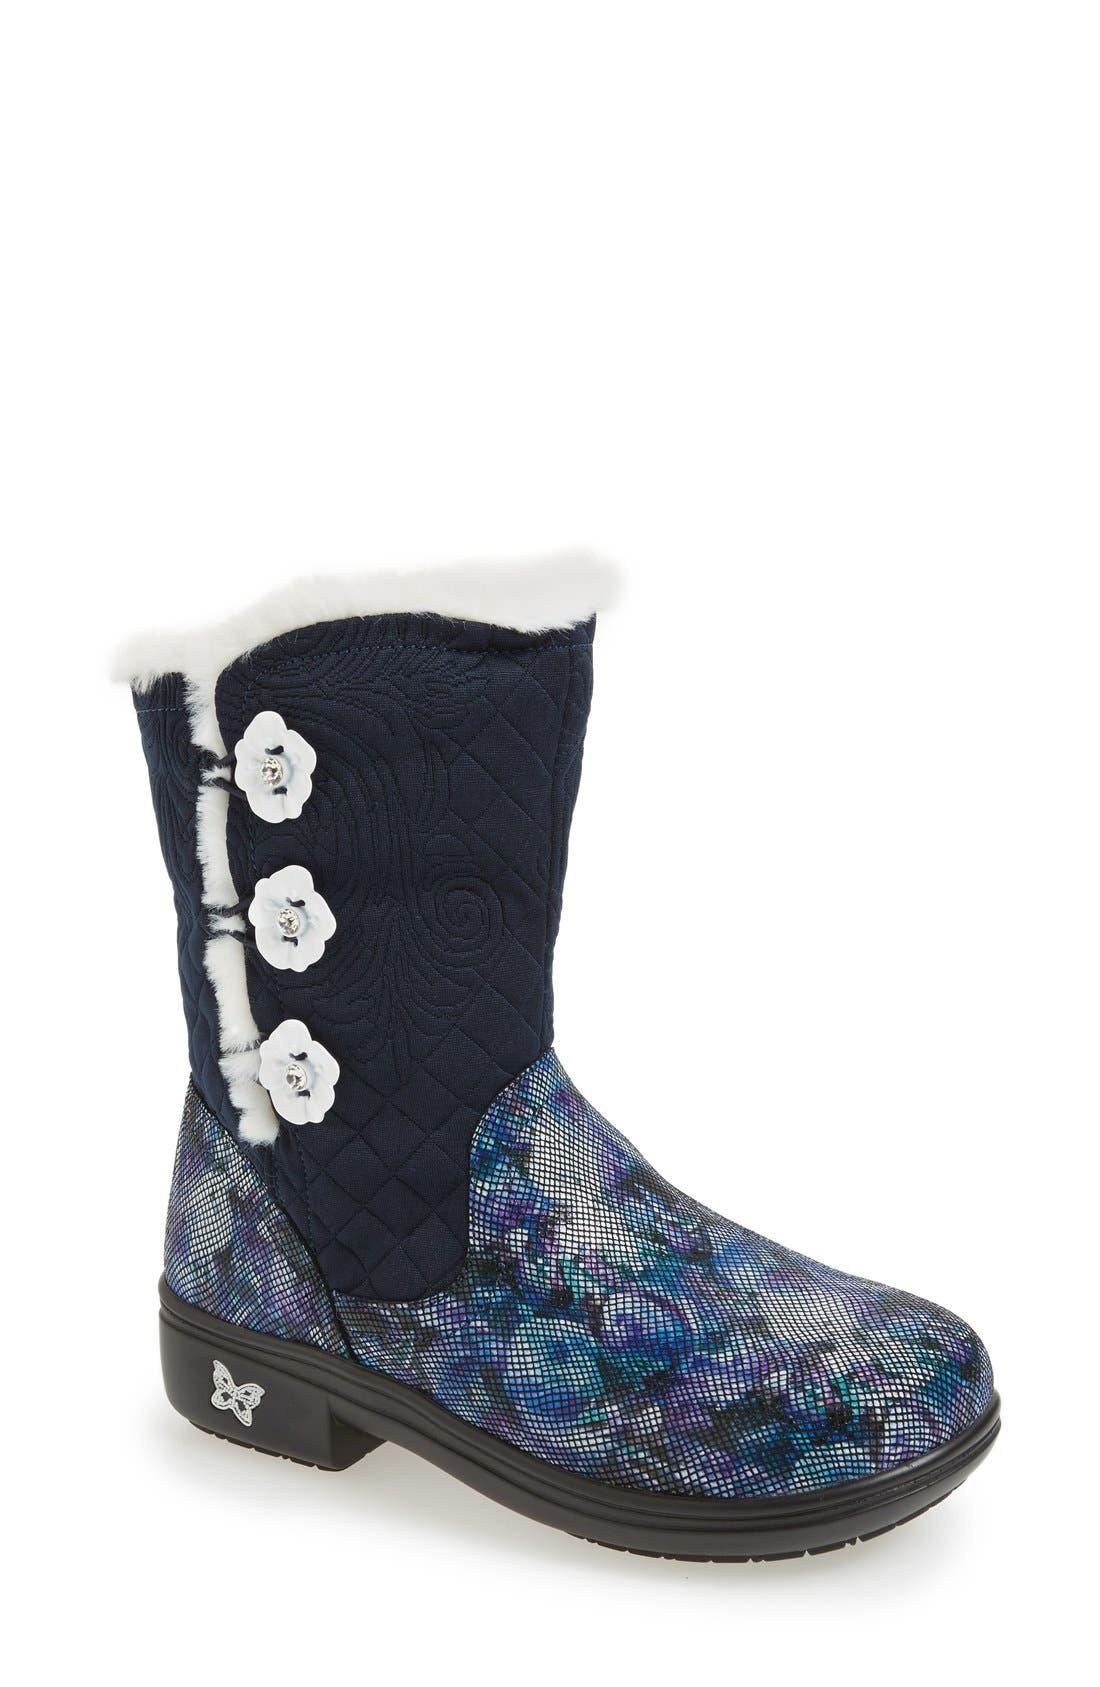 ALEGRIA 'Nanook' Suede Boot